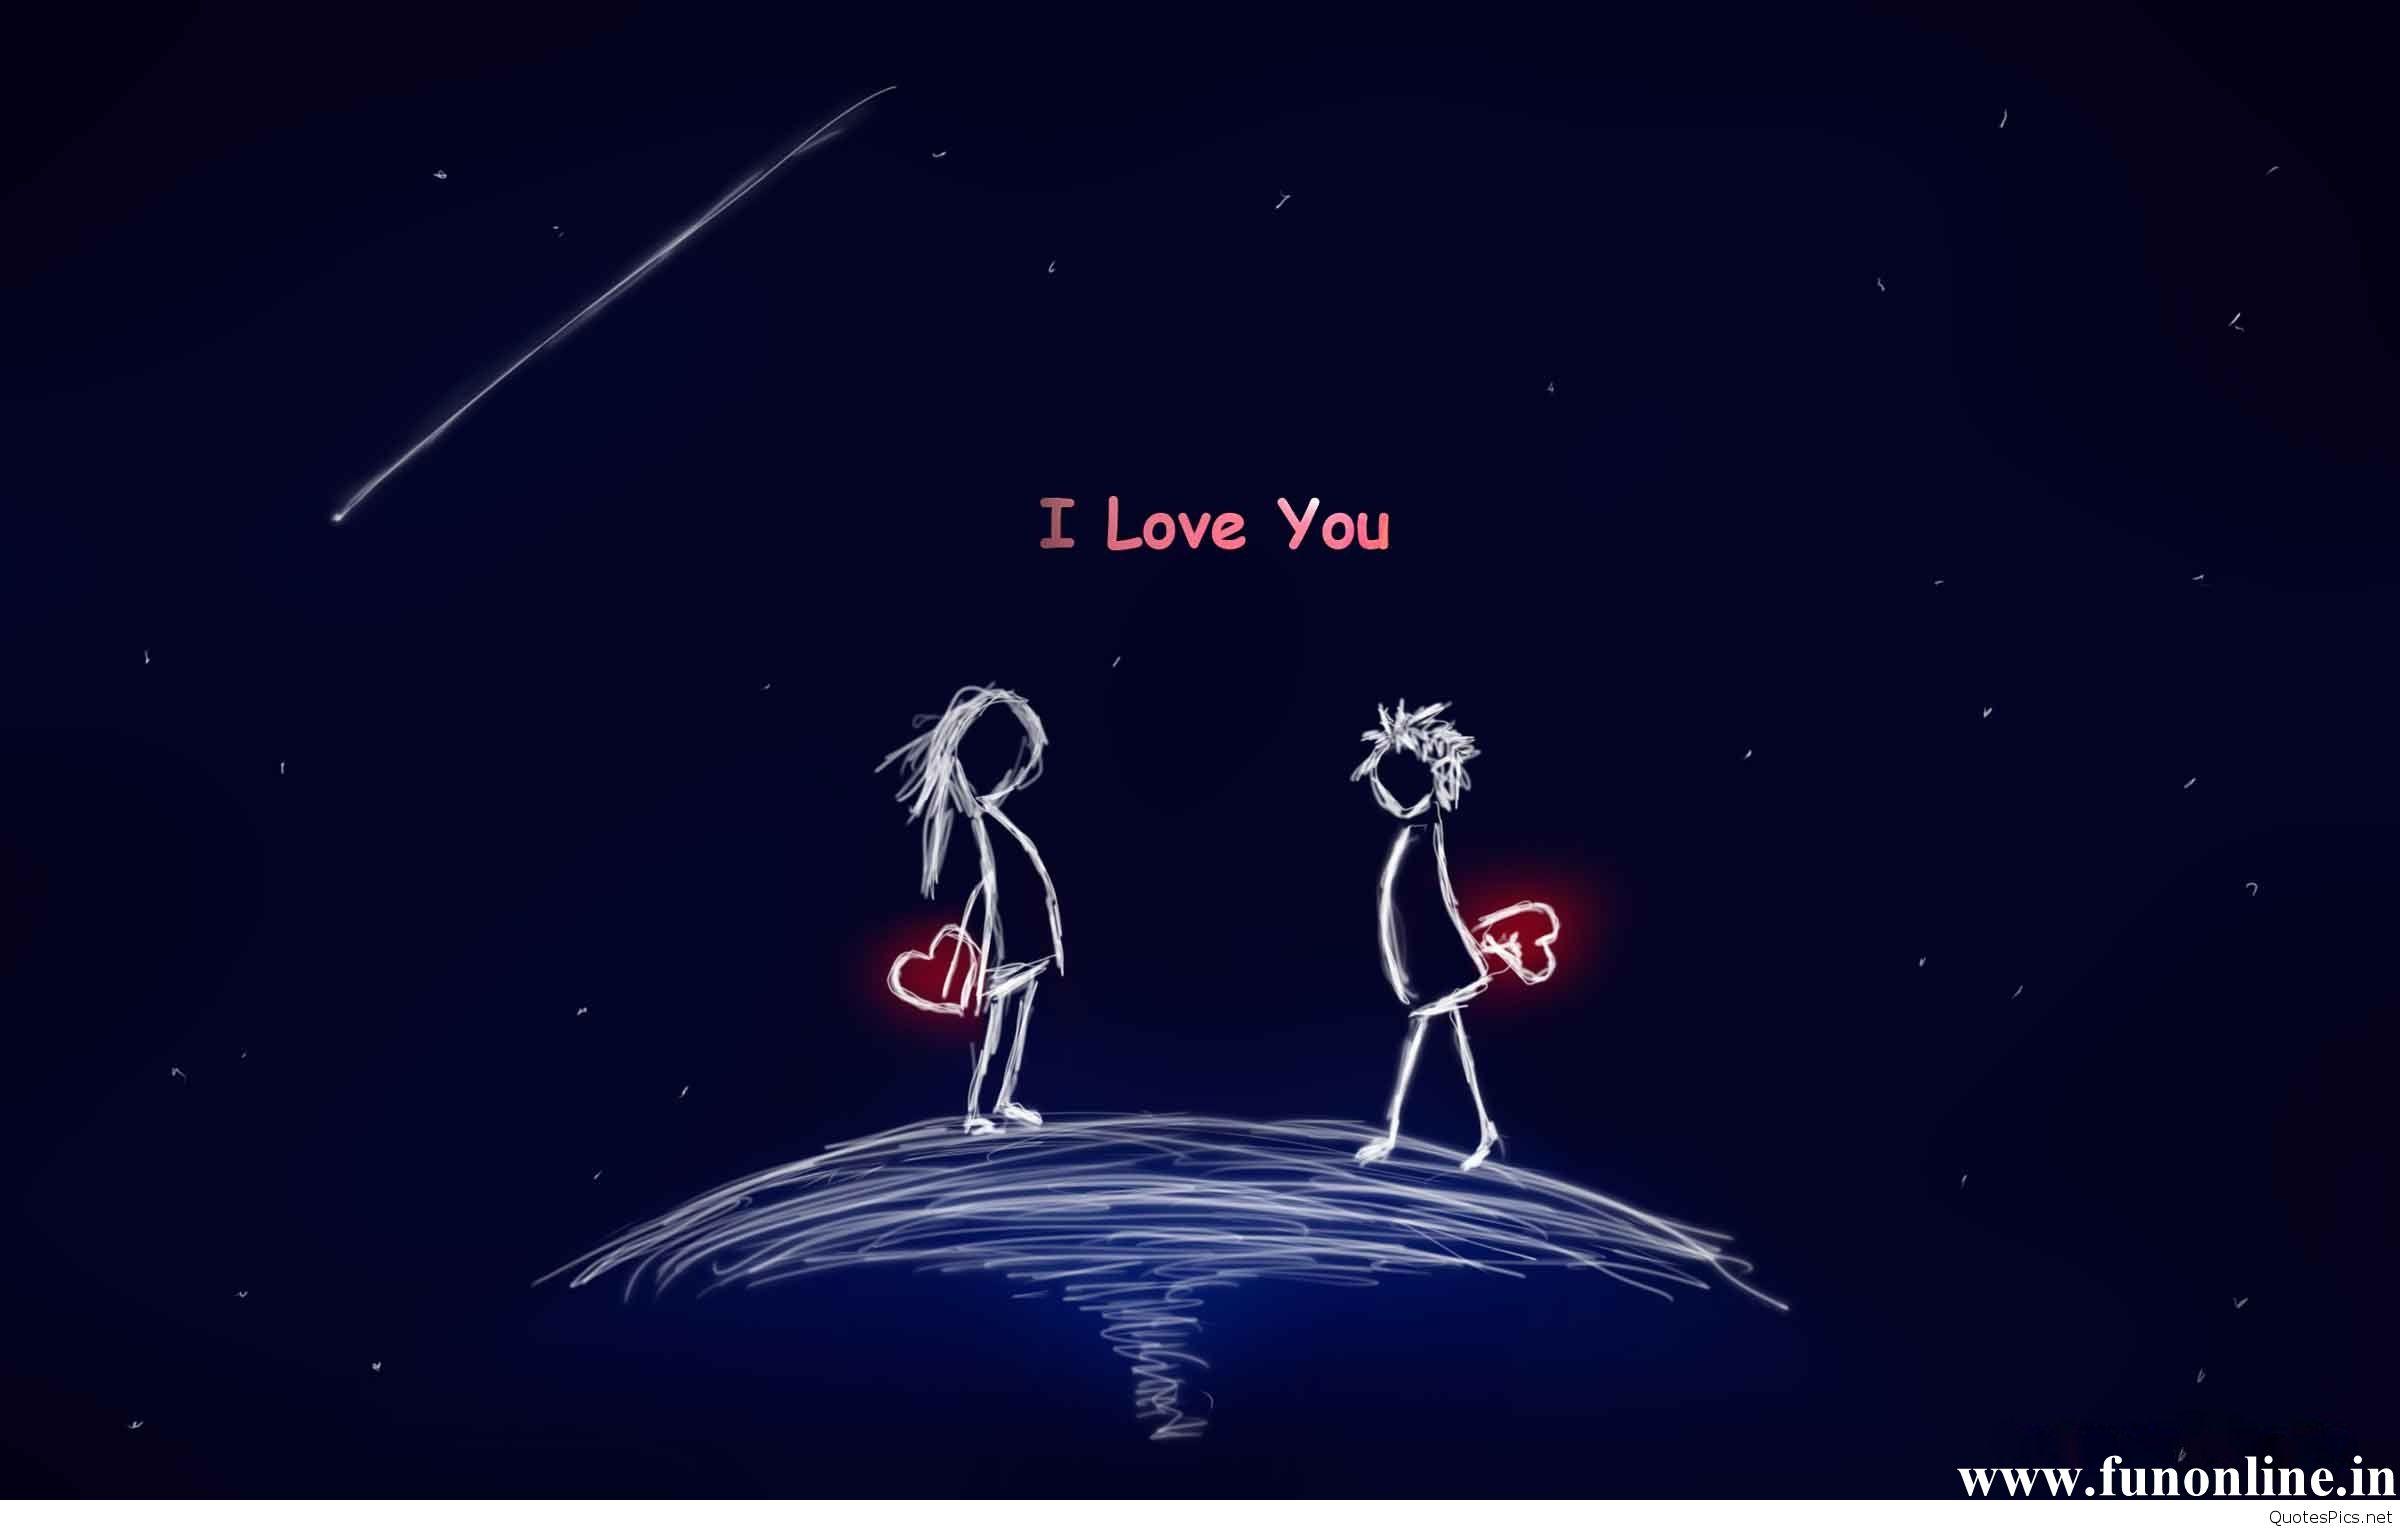 New Love Cartoon Shayari Wallpaper Love Animated Couple Do You Match Your Love 825x550 Download Hd Wallpaper Wallpapertip